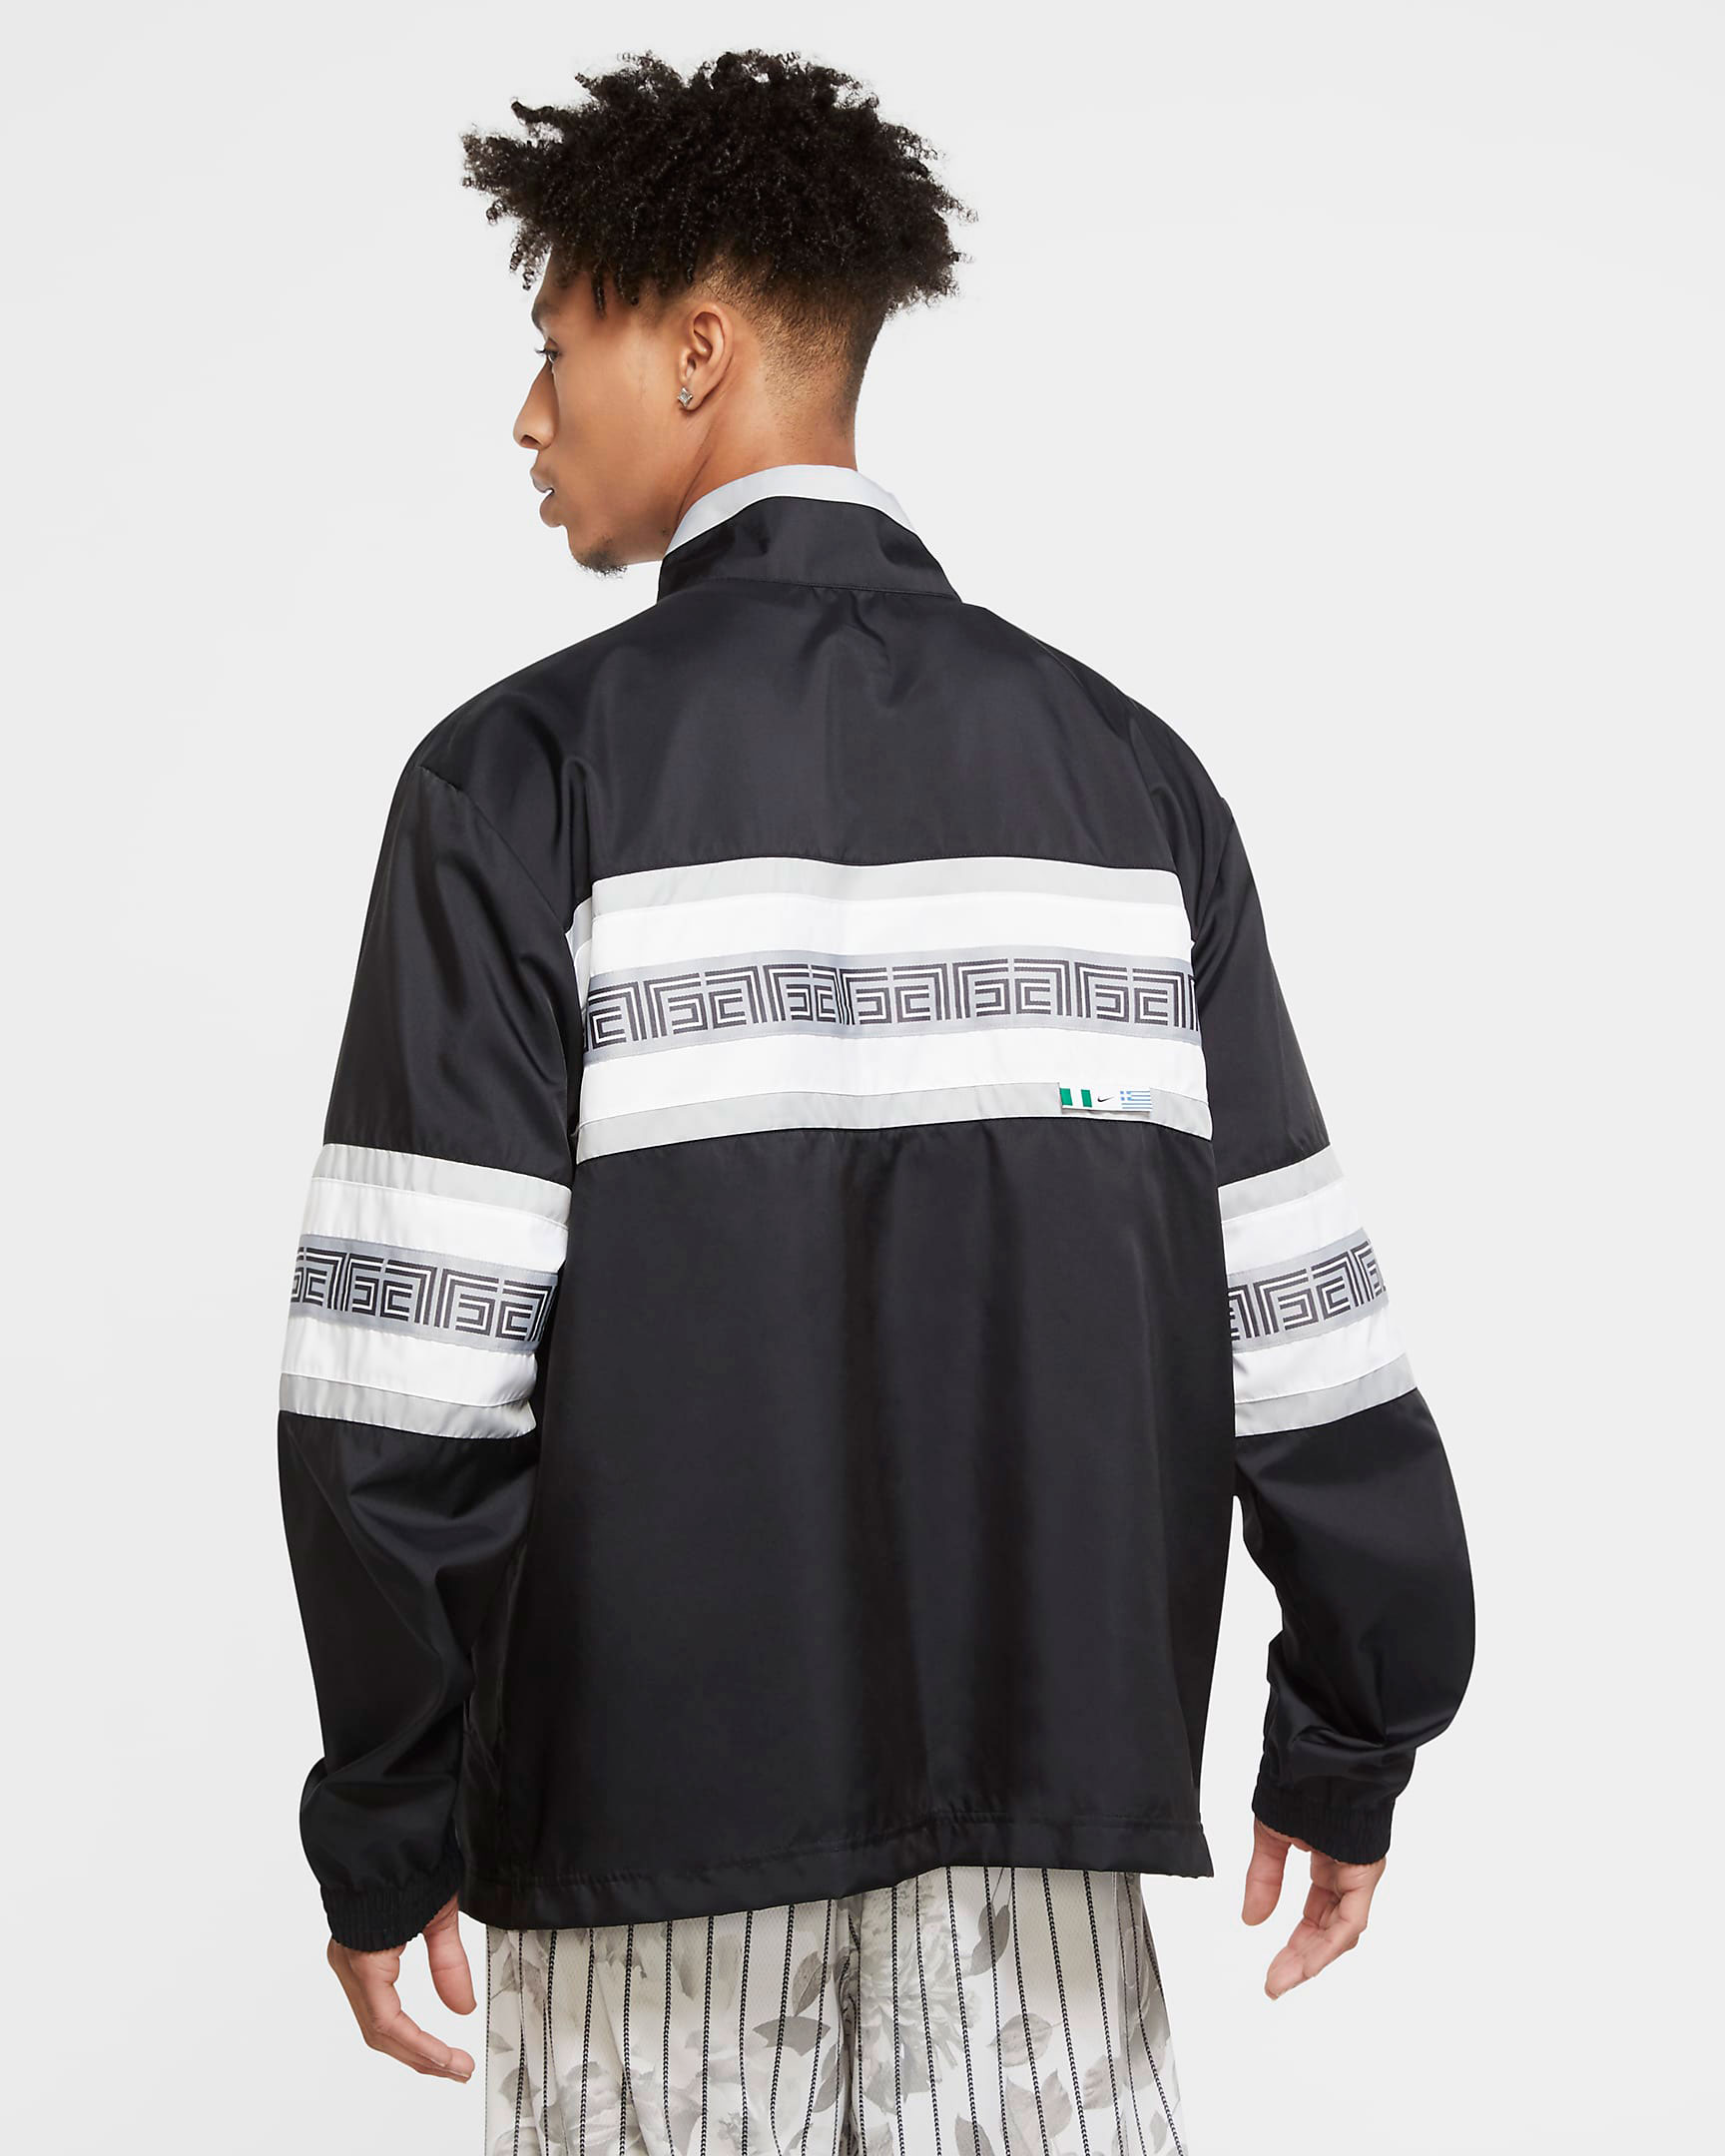 nike-giannis-jacket-black-white-2